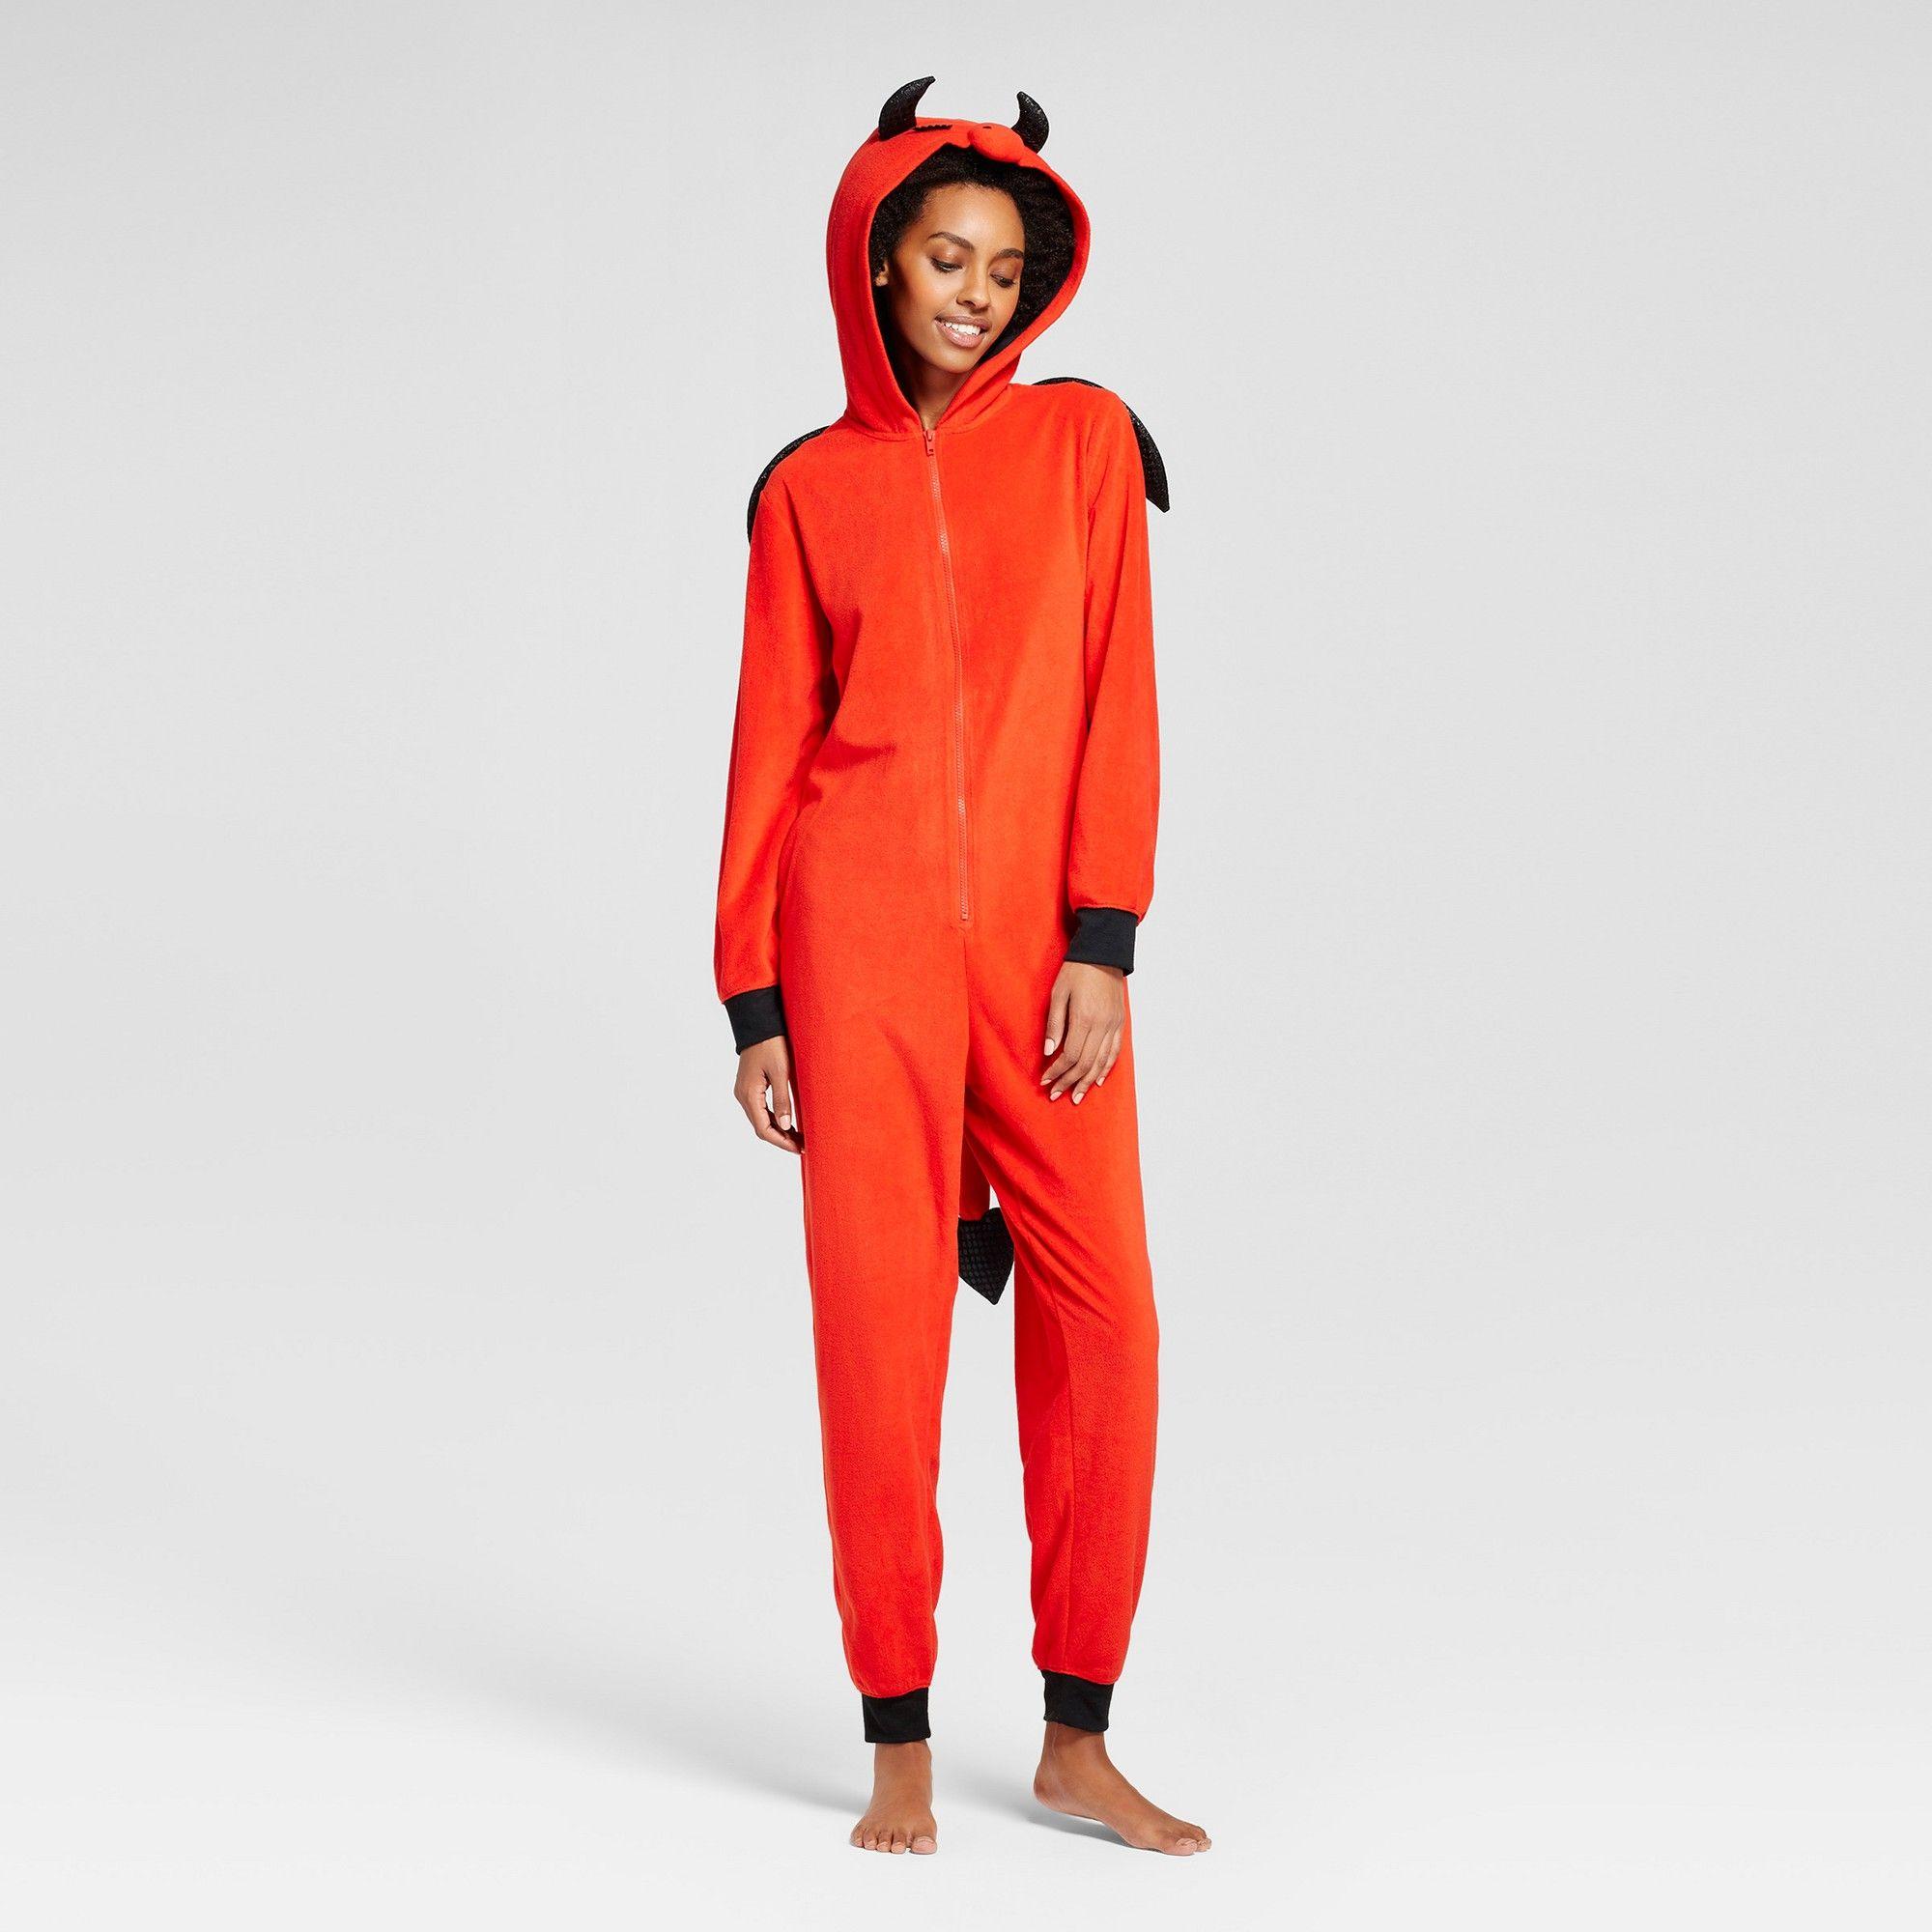 f23f48d5fb8486 Women's Devil Union Suit with Wing - Xhilaration Red Xxl, Orange ...